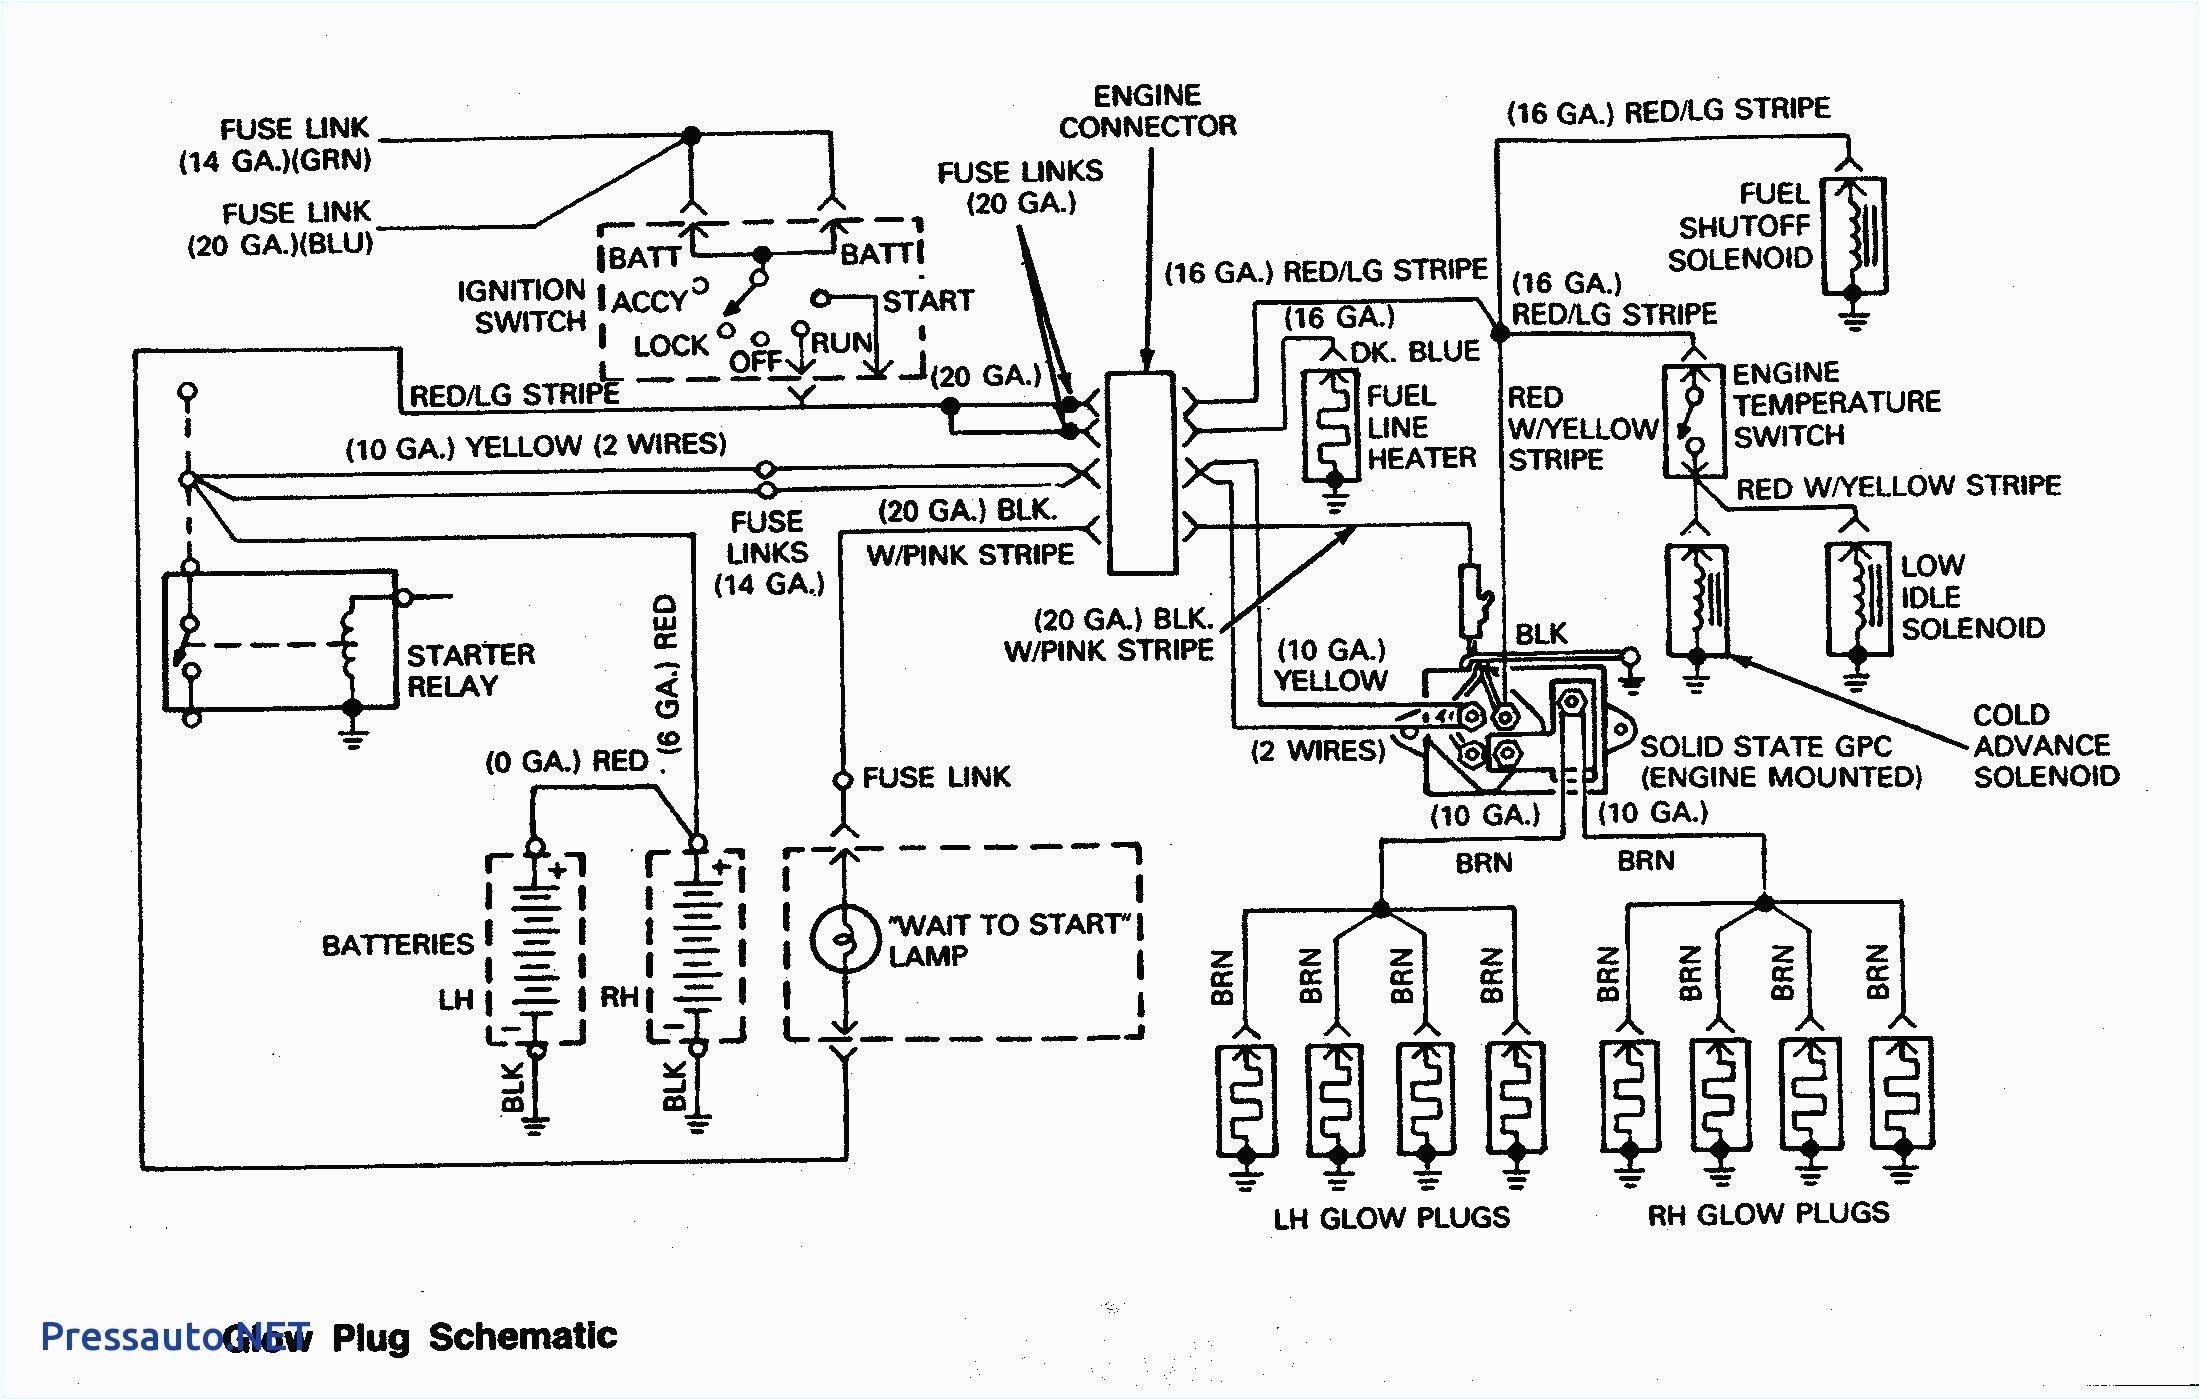 7 3 glow plug relay wiring wiring diagram img glow plug relay wiring diagram 7 3 glow plug relay wiring diagram